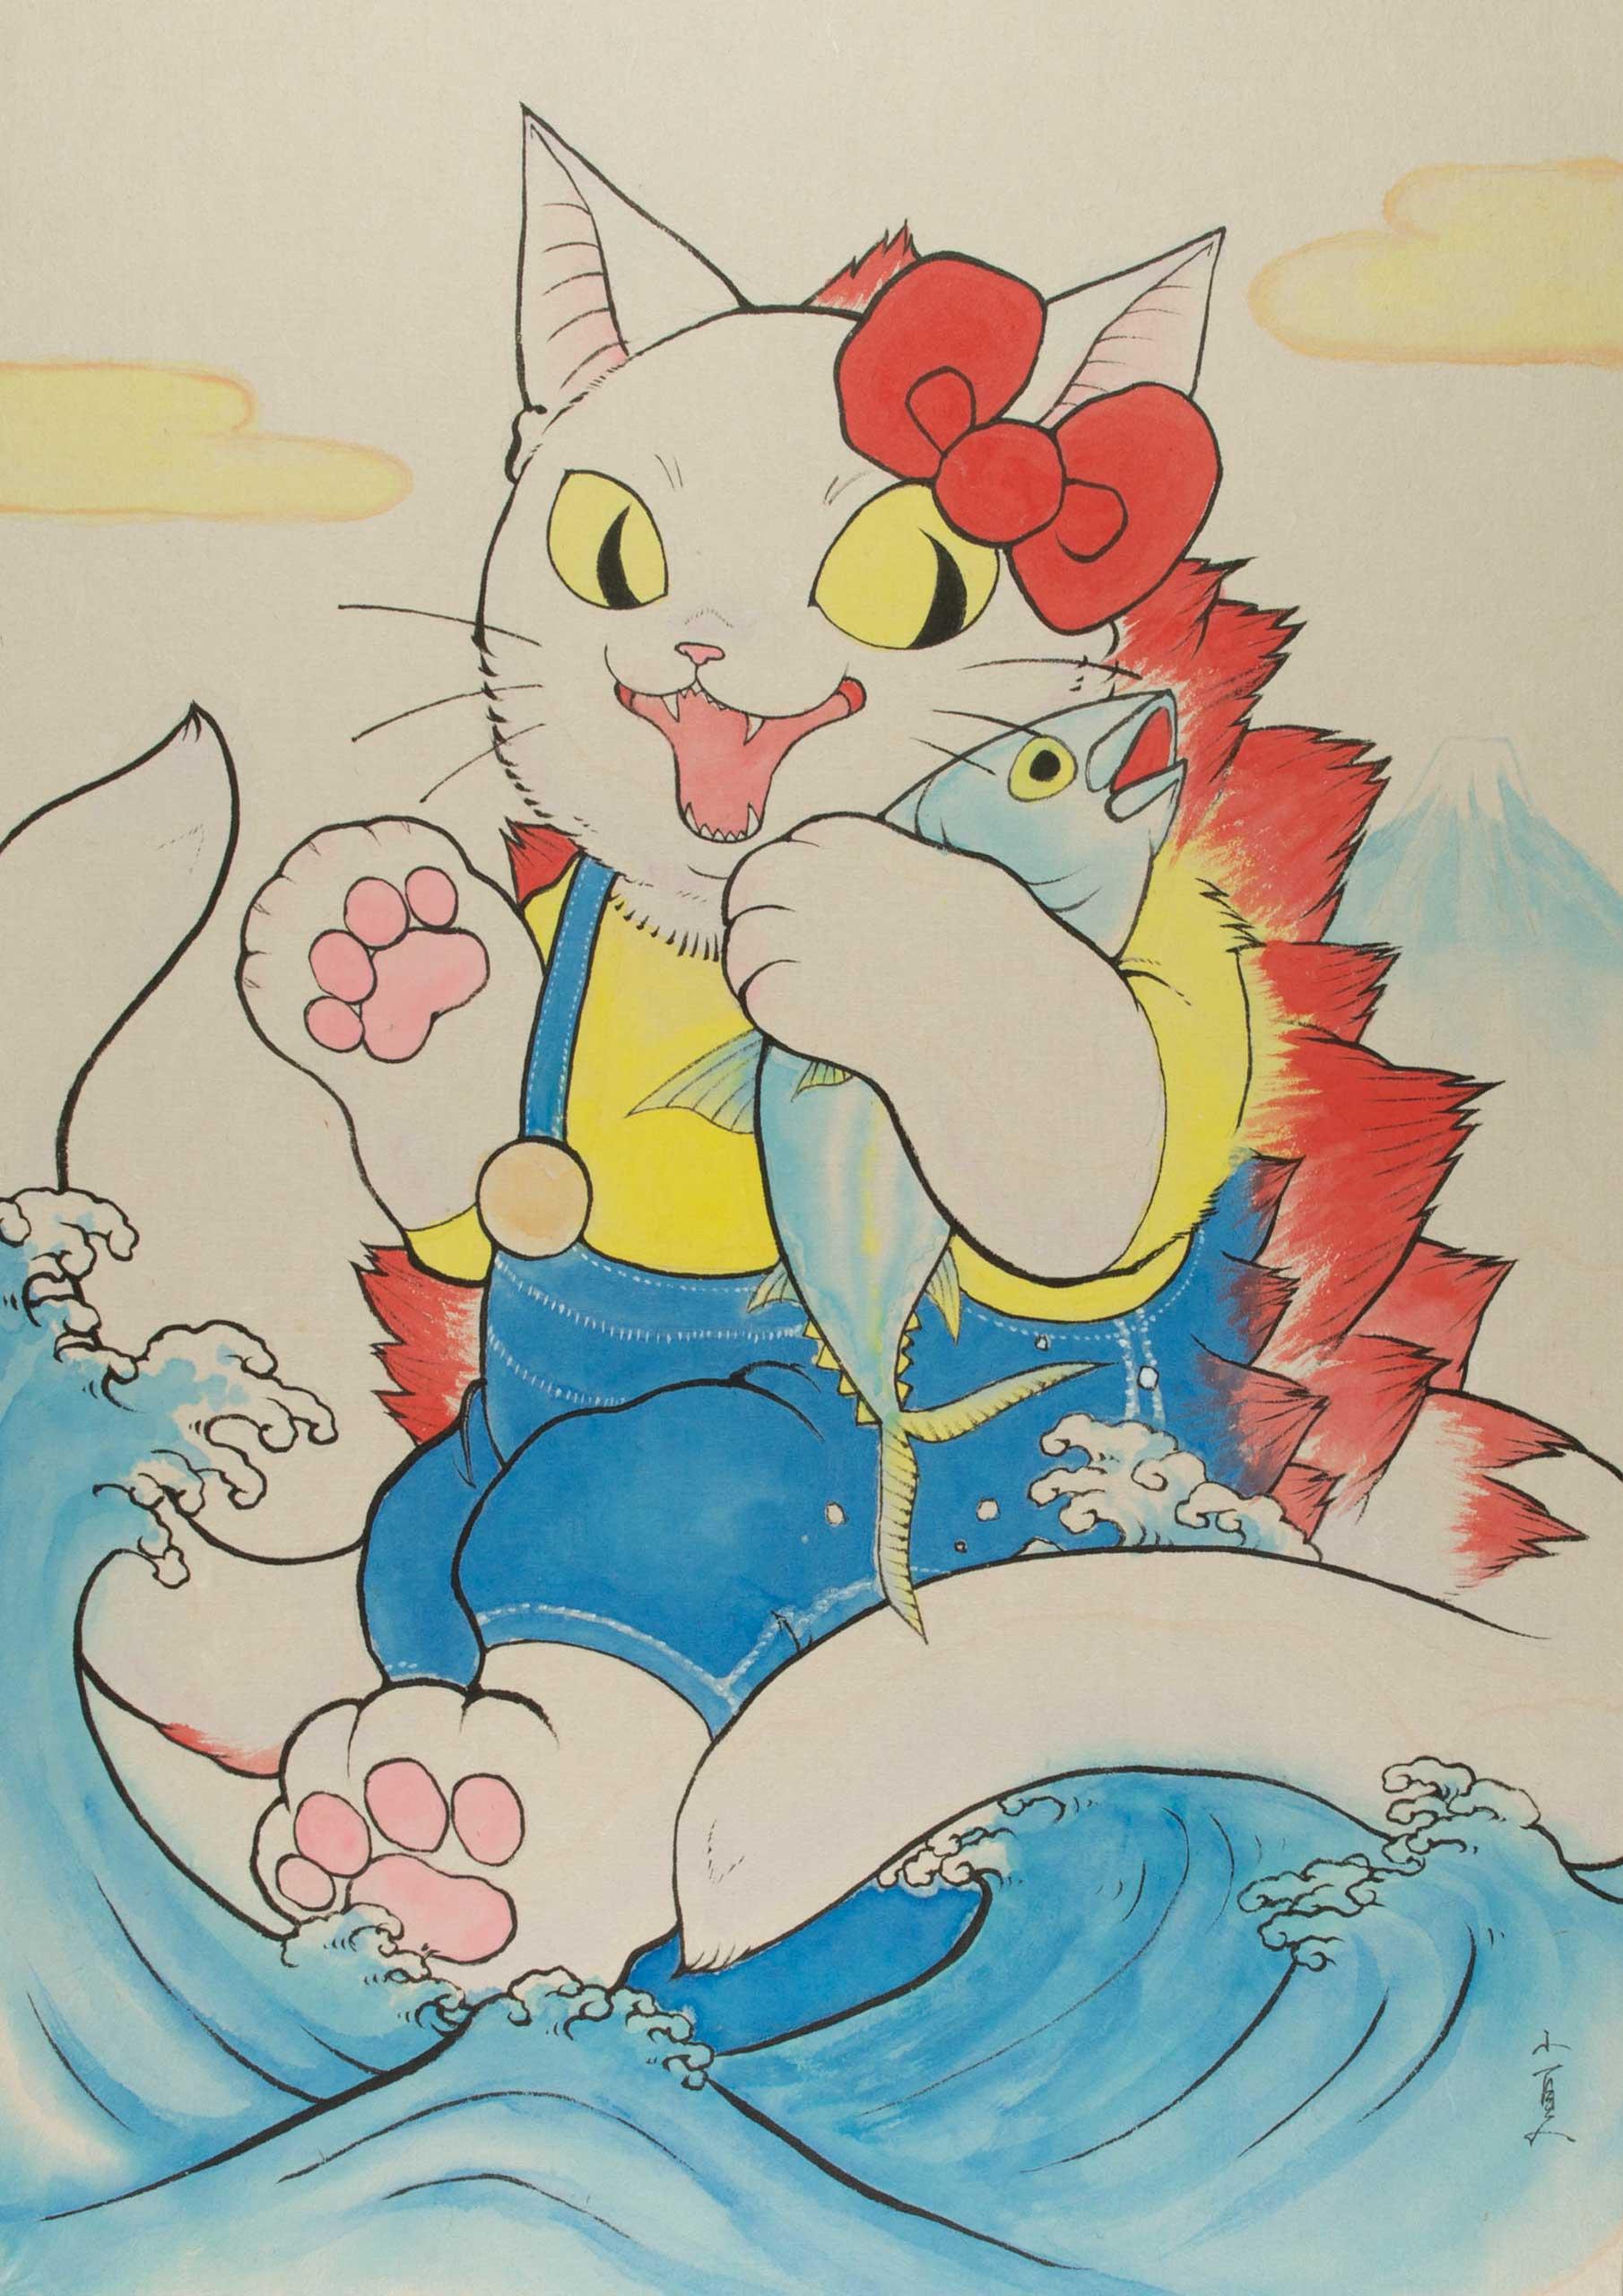 'Kitty Negora' by Konatsu